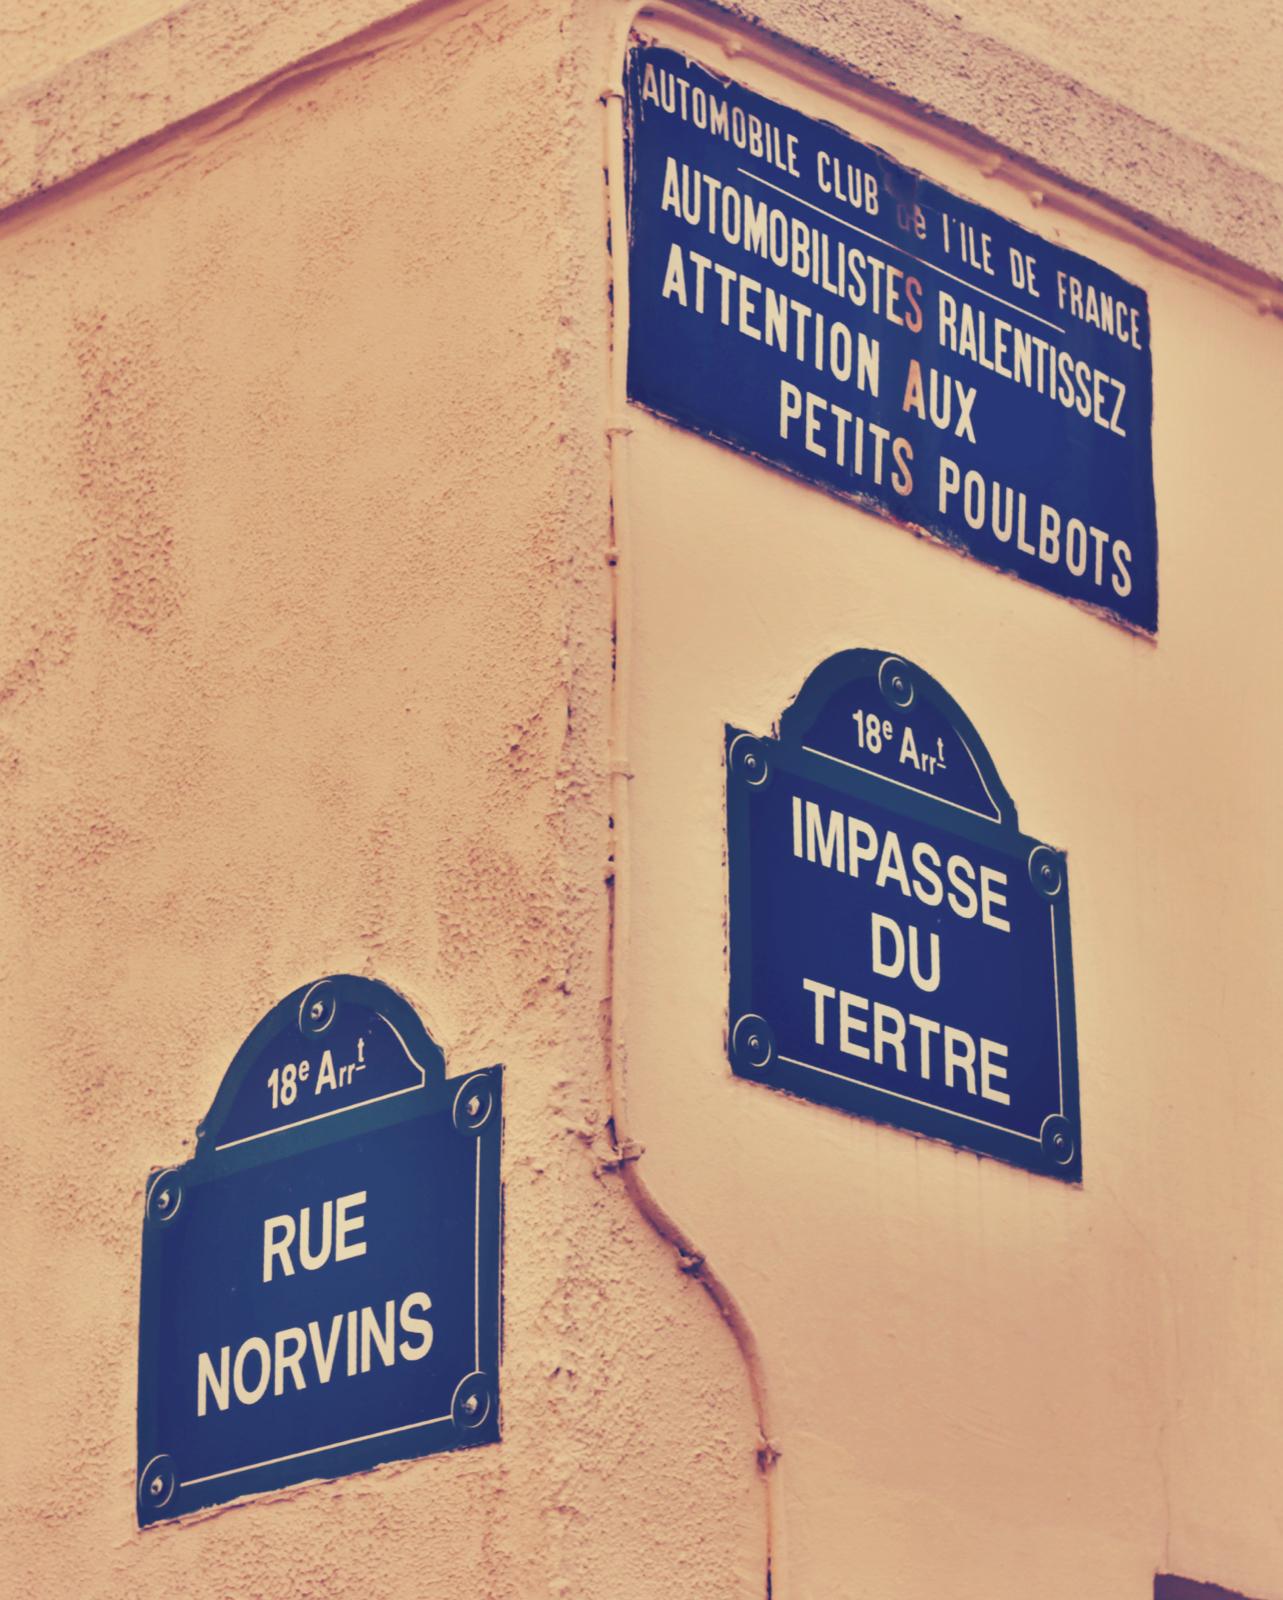 Rue.jpeg